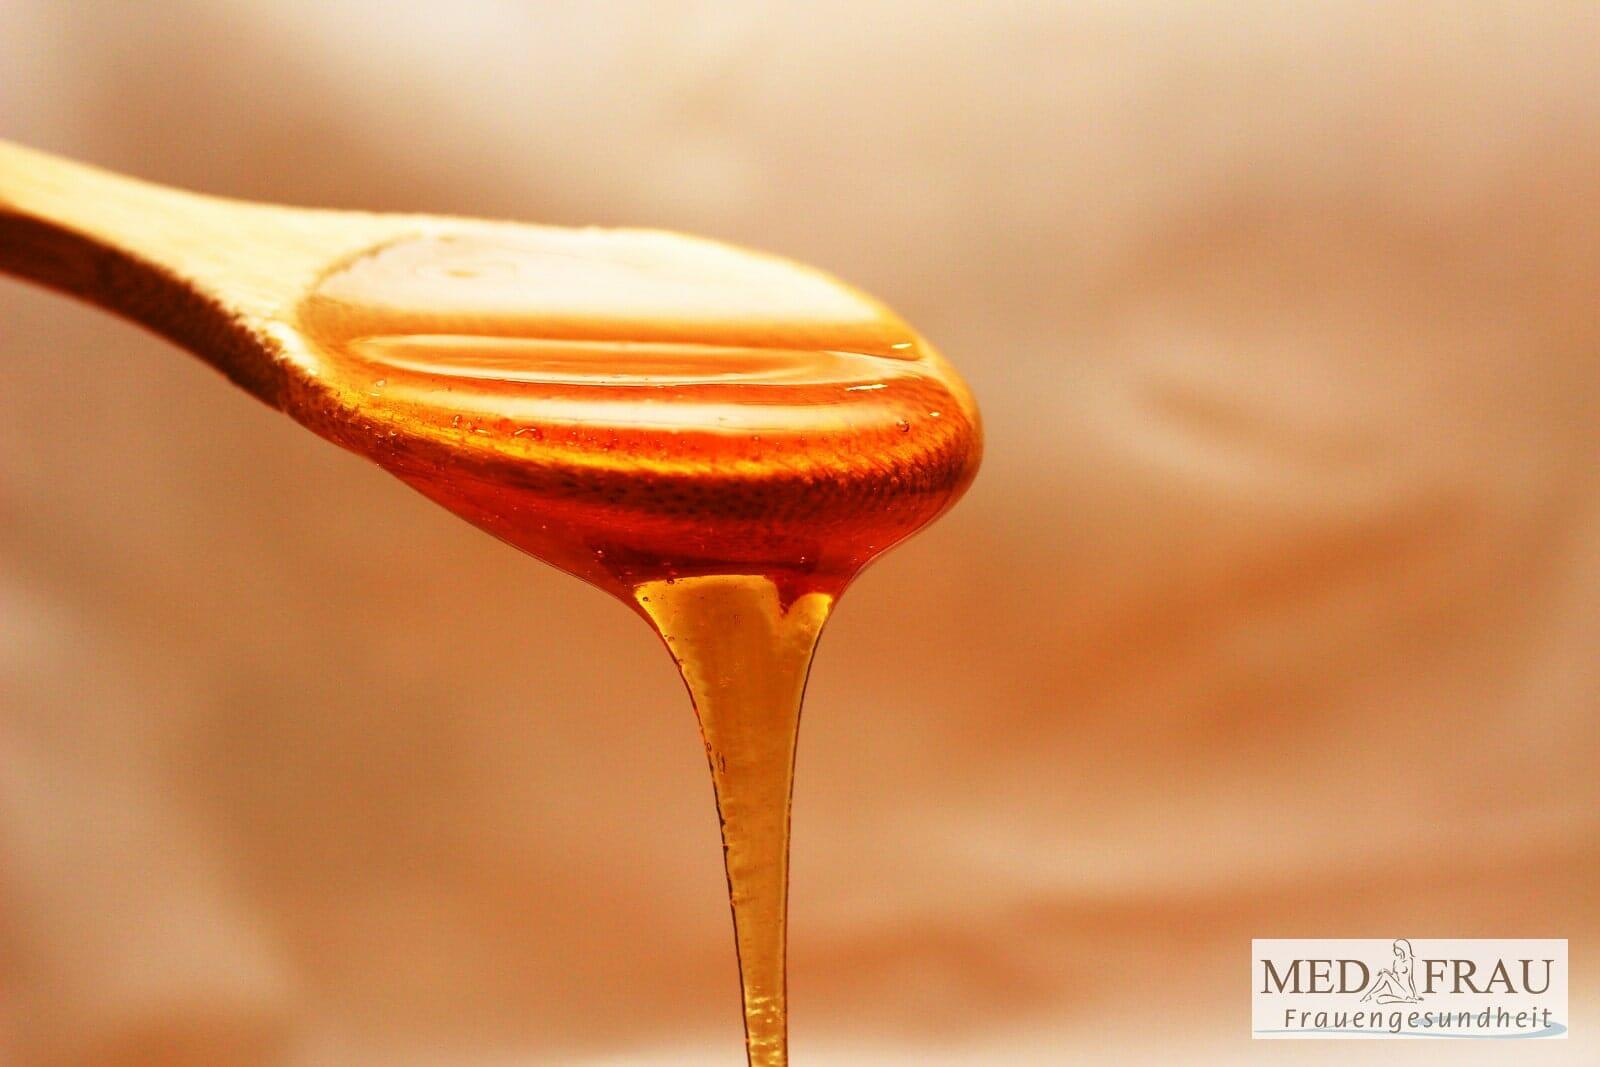 Honig oder Aciclovir